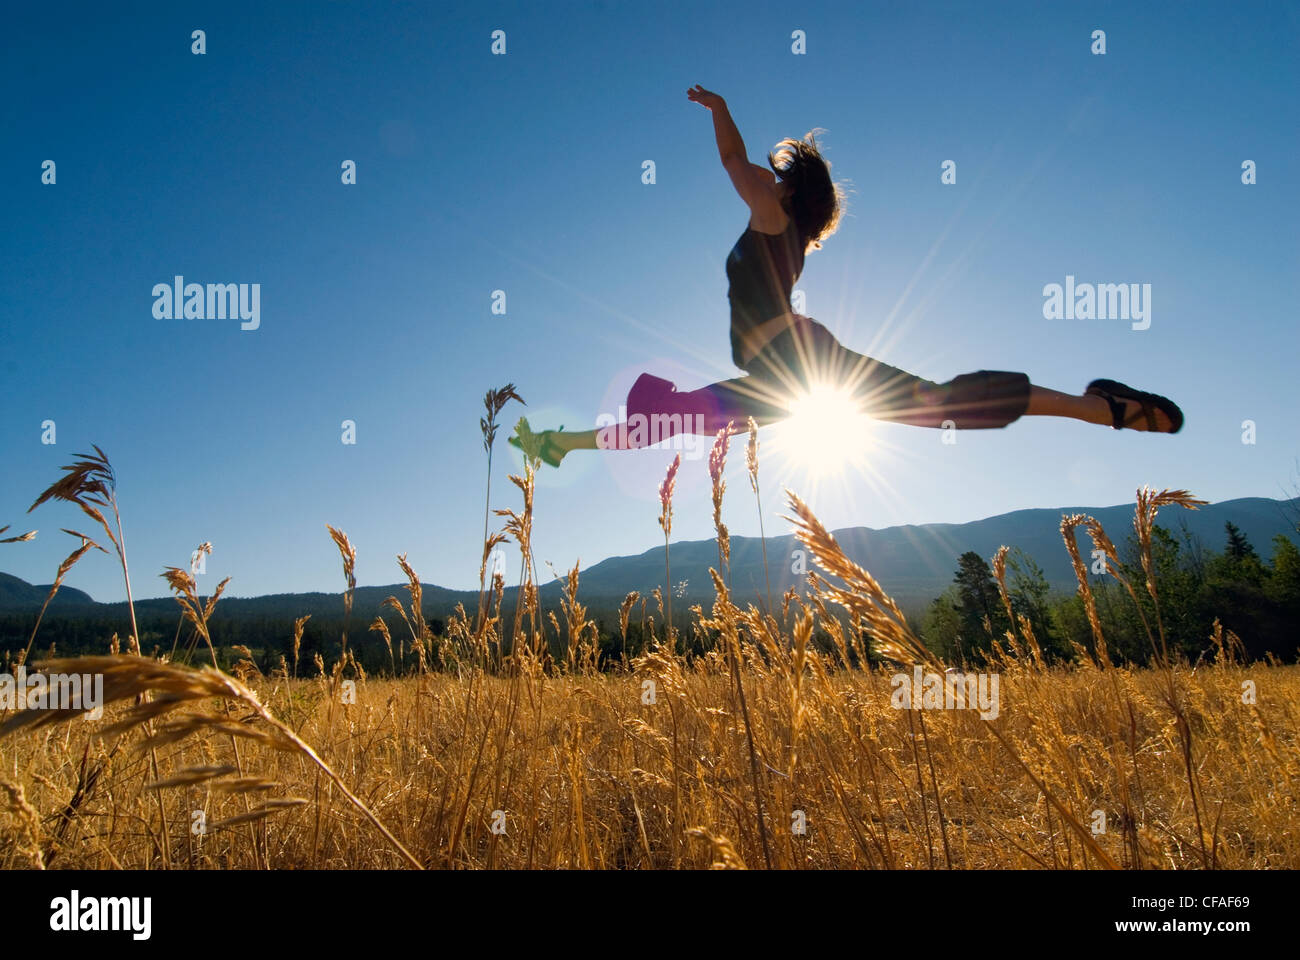 Female dancer in a grassy field with sun shining, Tatlayoko Lake, British Columbia, Canada. - Stock Image